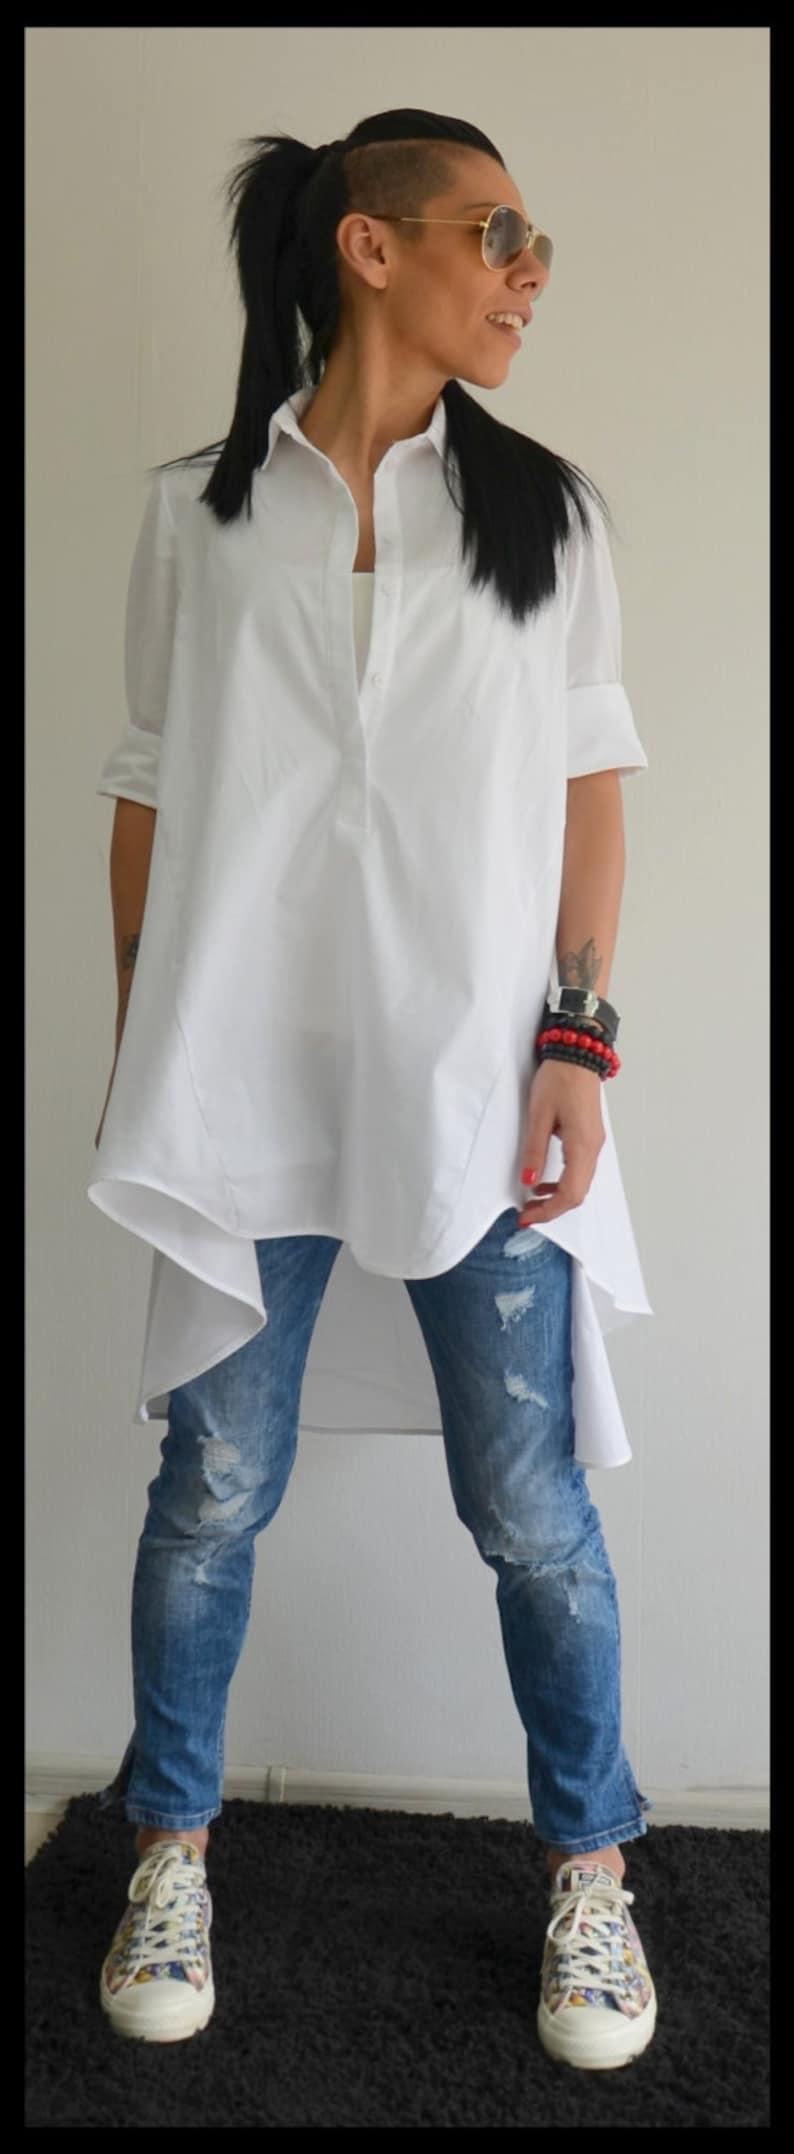 White Blouse Tunic Top Clothing Women Maternity Shirt Plus Size Tunic Plus Size Clothing Shirt